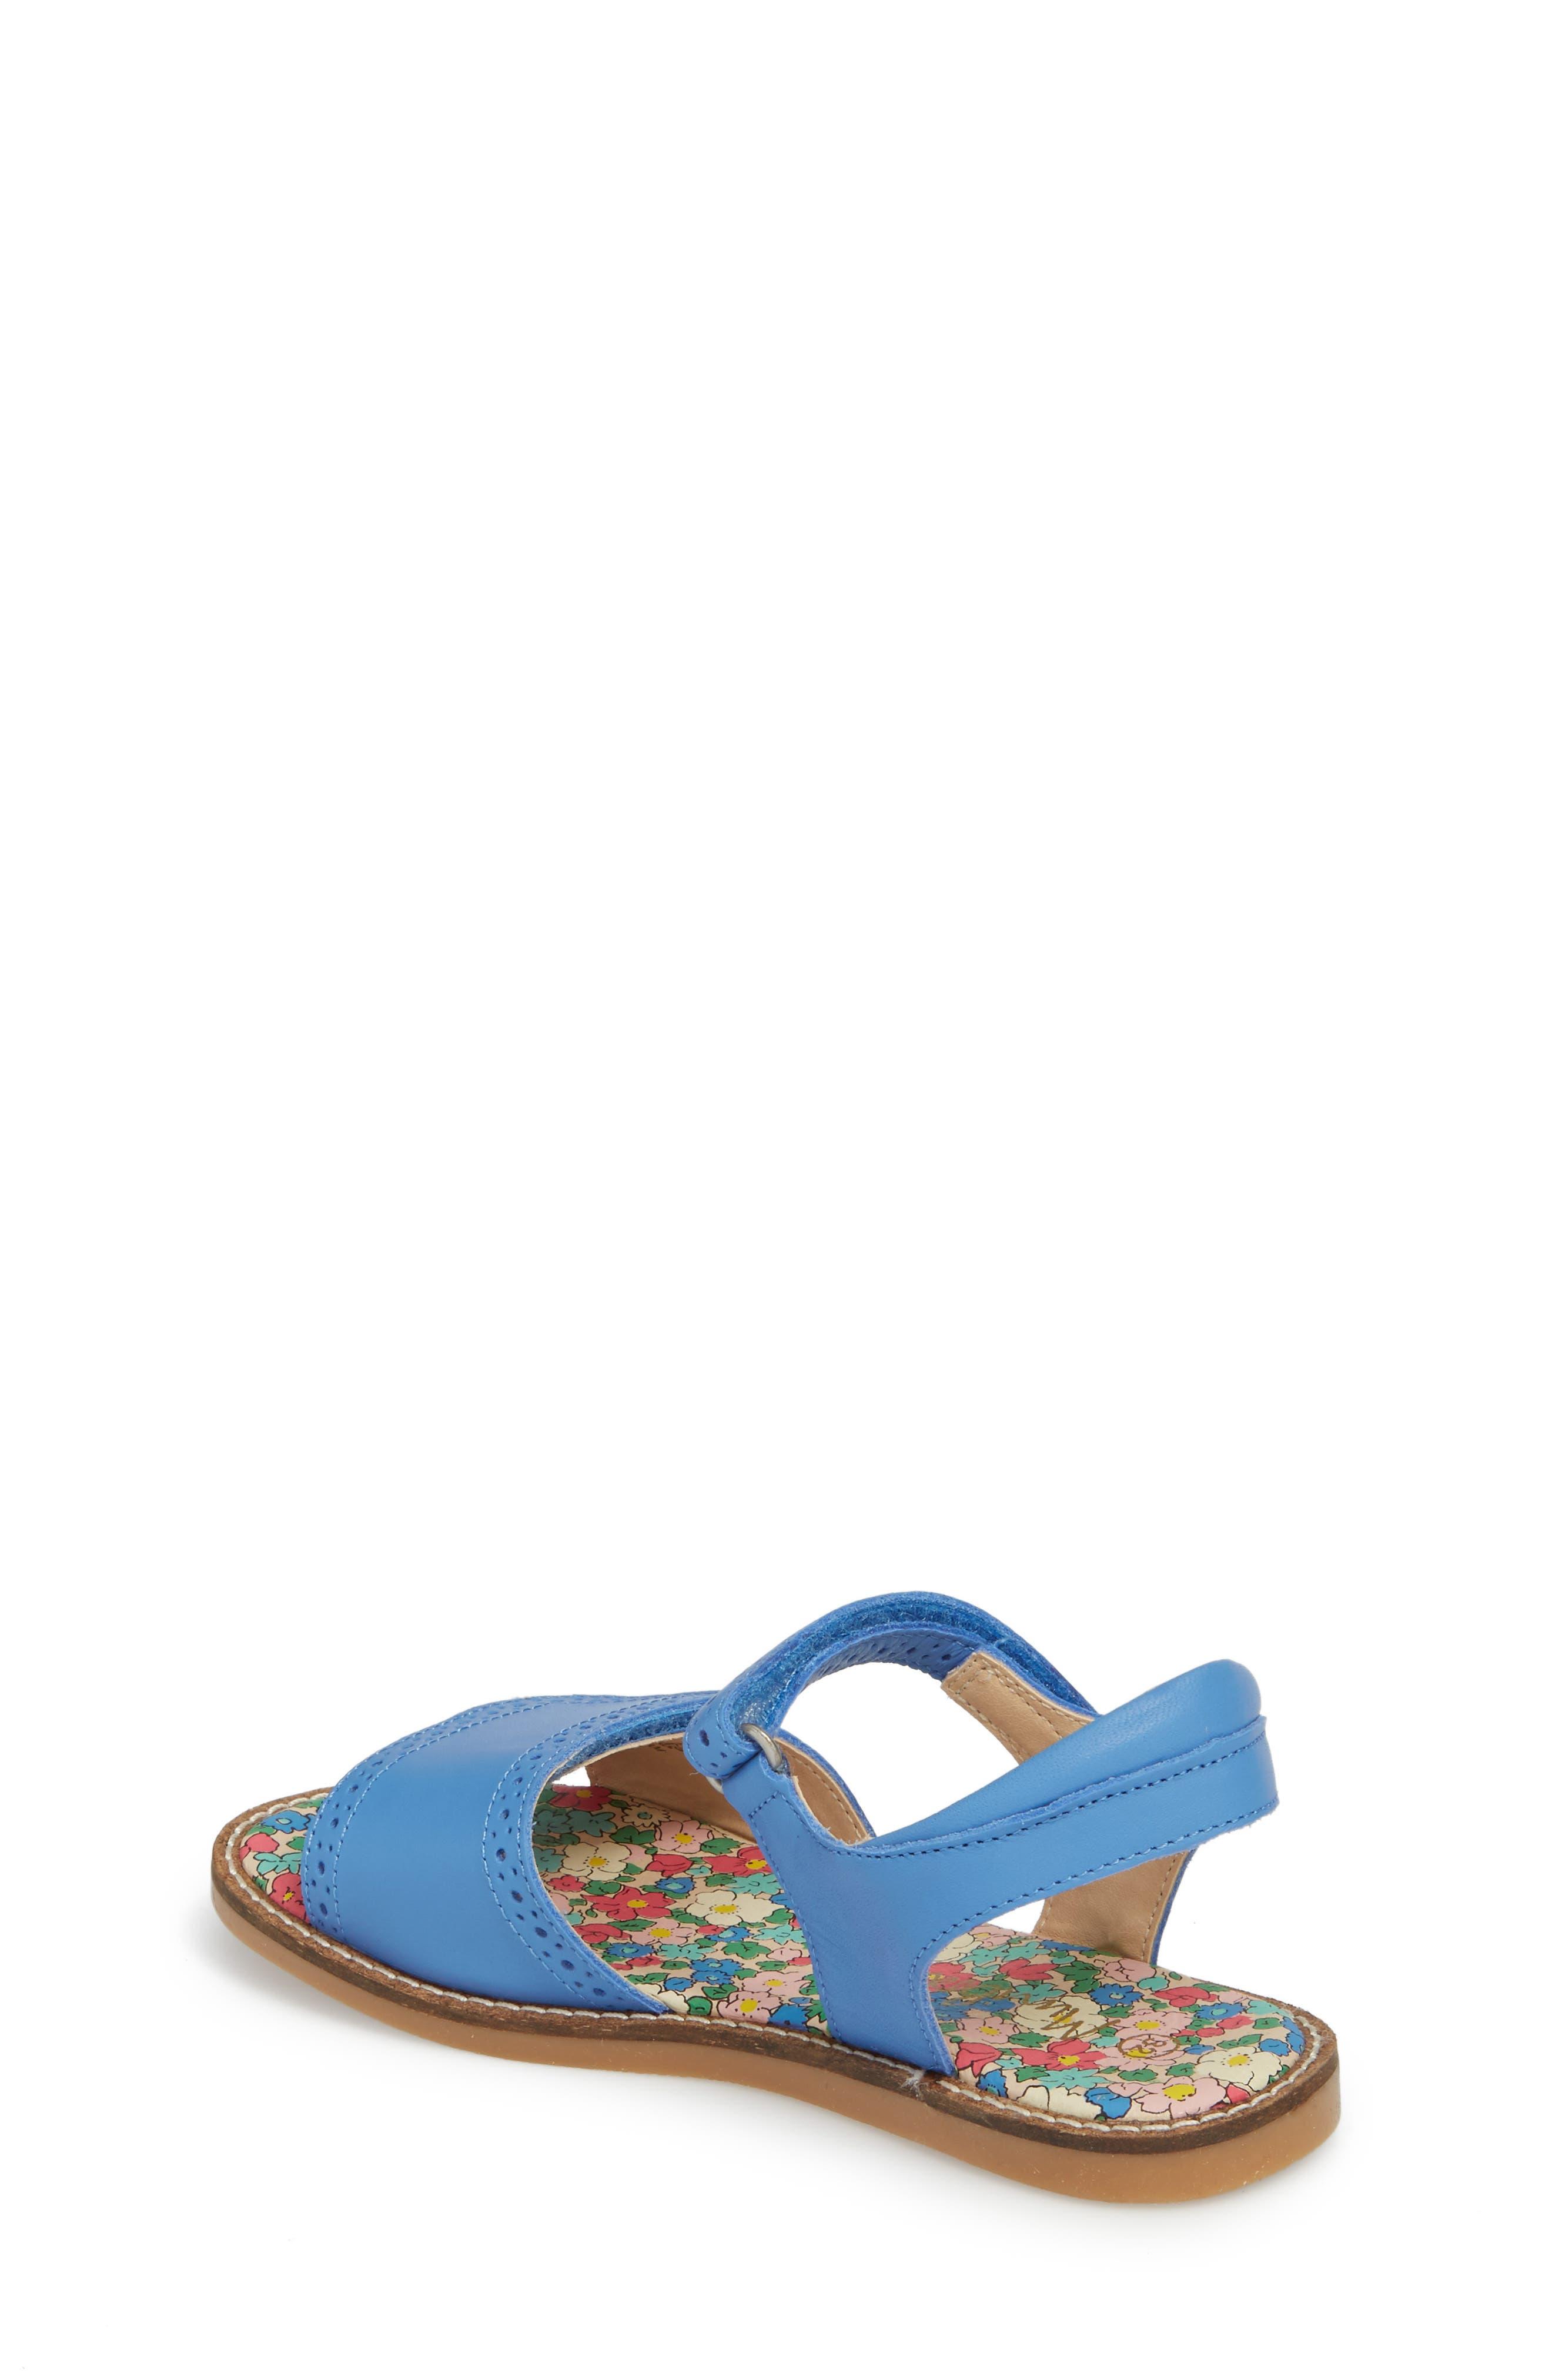 Adjustable Quarter Strap Sandal,                             Alternate thumbnail 2, color,                             424